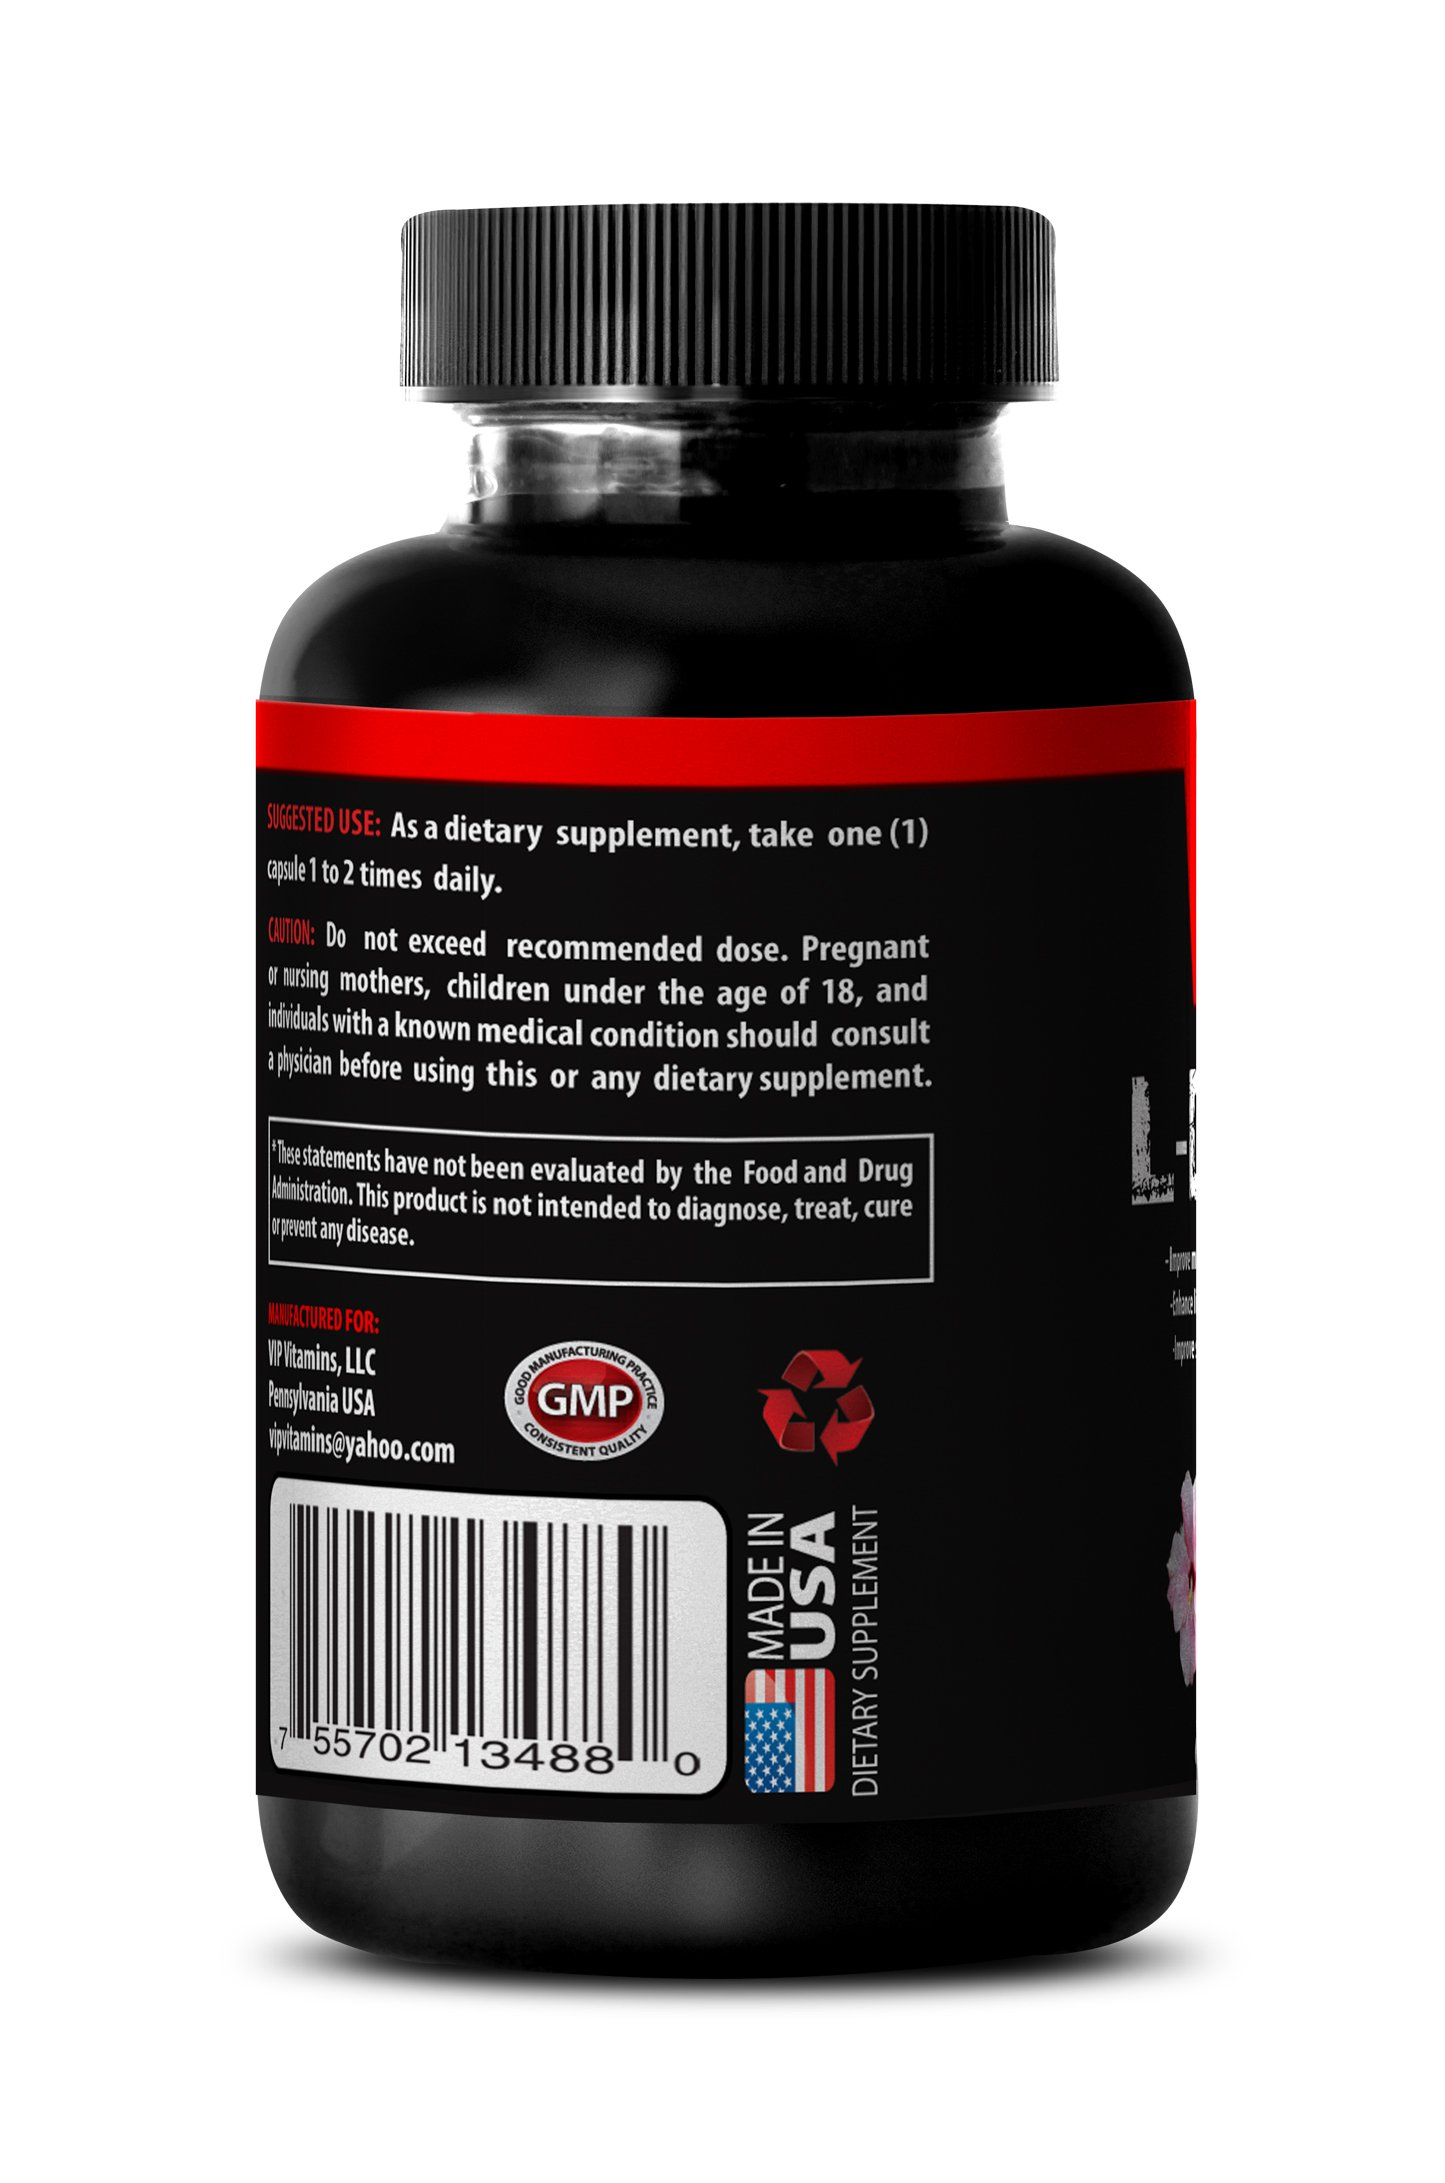 Macuna Pruriens L-Dopa Powder - Mucuna Pruriens Extract (6 bottles 360 capsules) by VIP VITAMINS (Image #3)